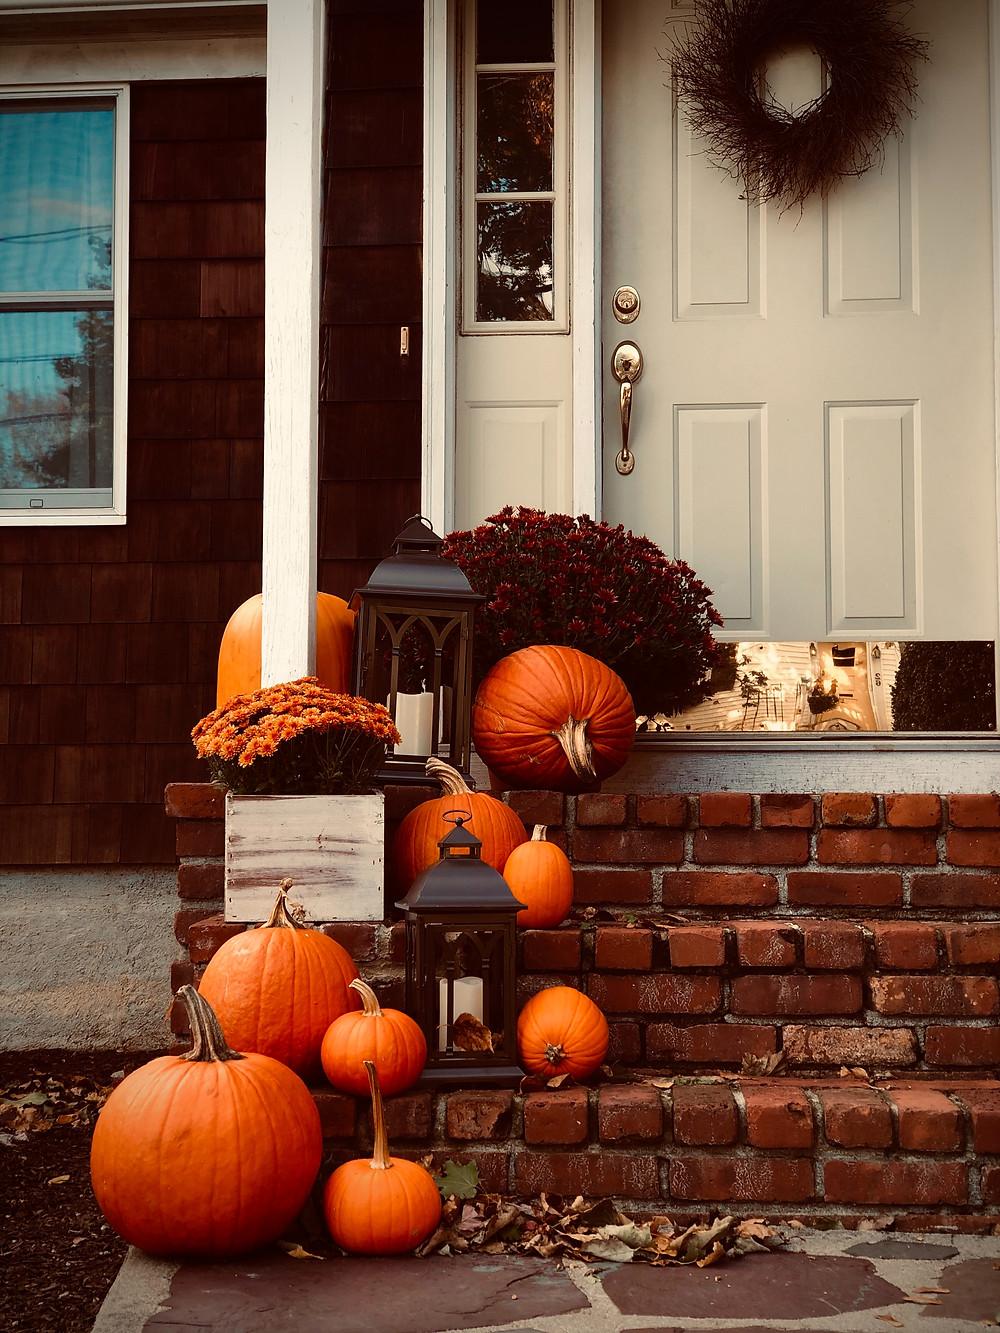 fall leaves, pumpkins, fall home, autumn decorations, fall decorations, seasonal decorations, curb appeal, real estate